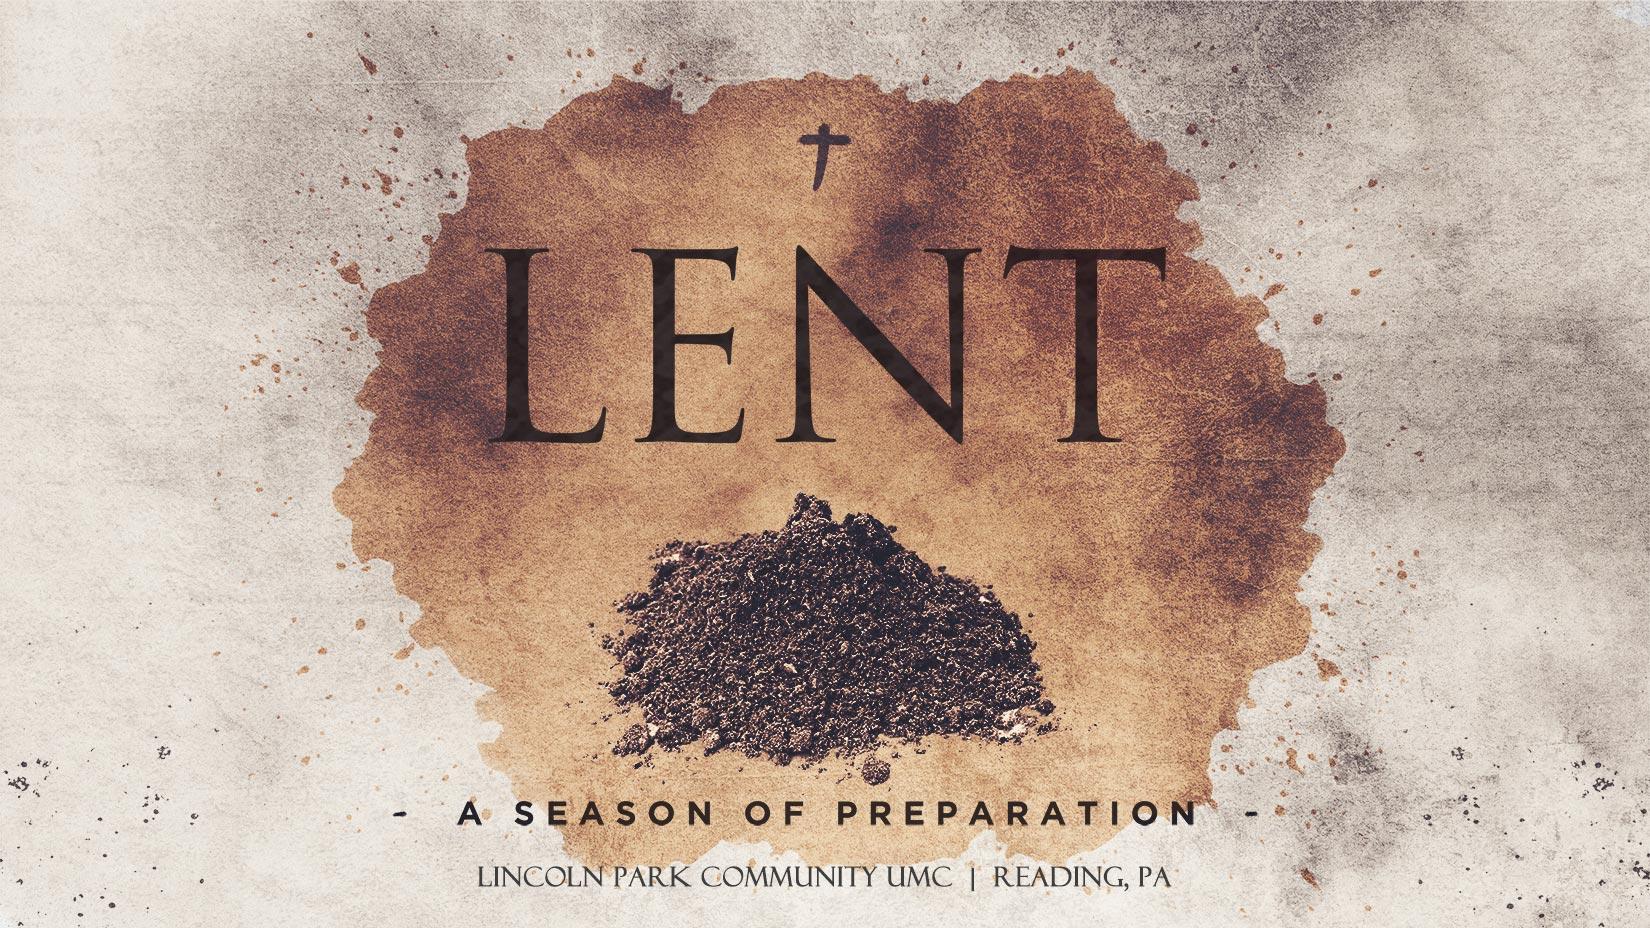 Lent - A Season Of Preparation - Lincoln Park Community UMC